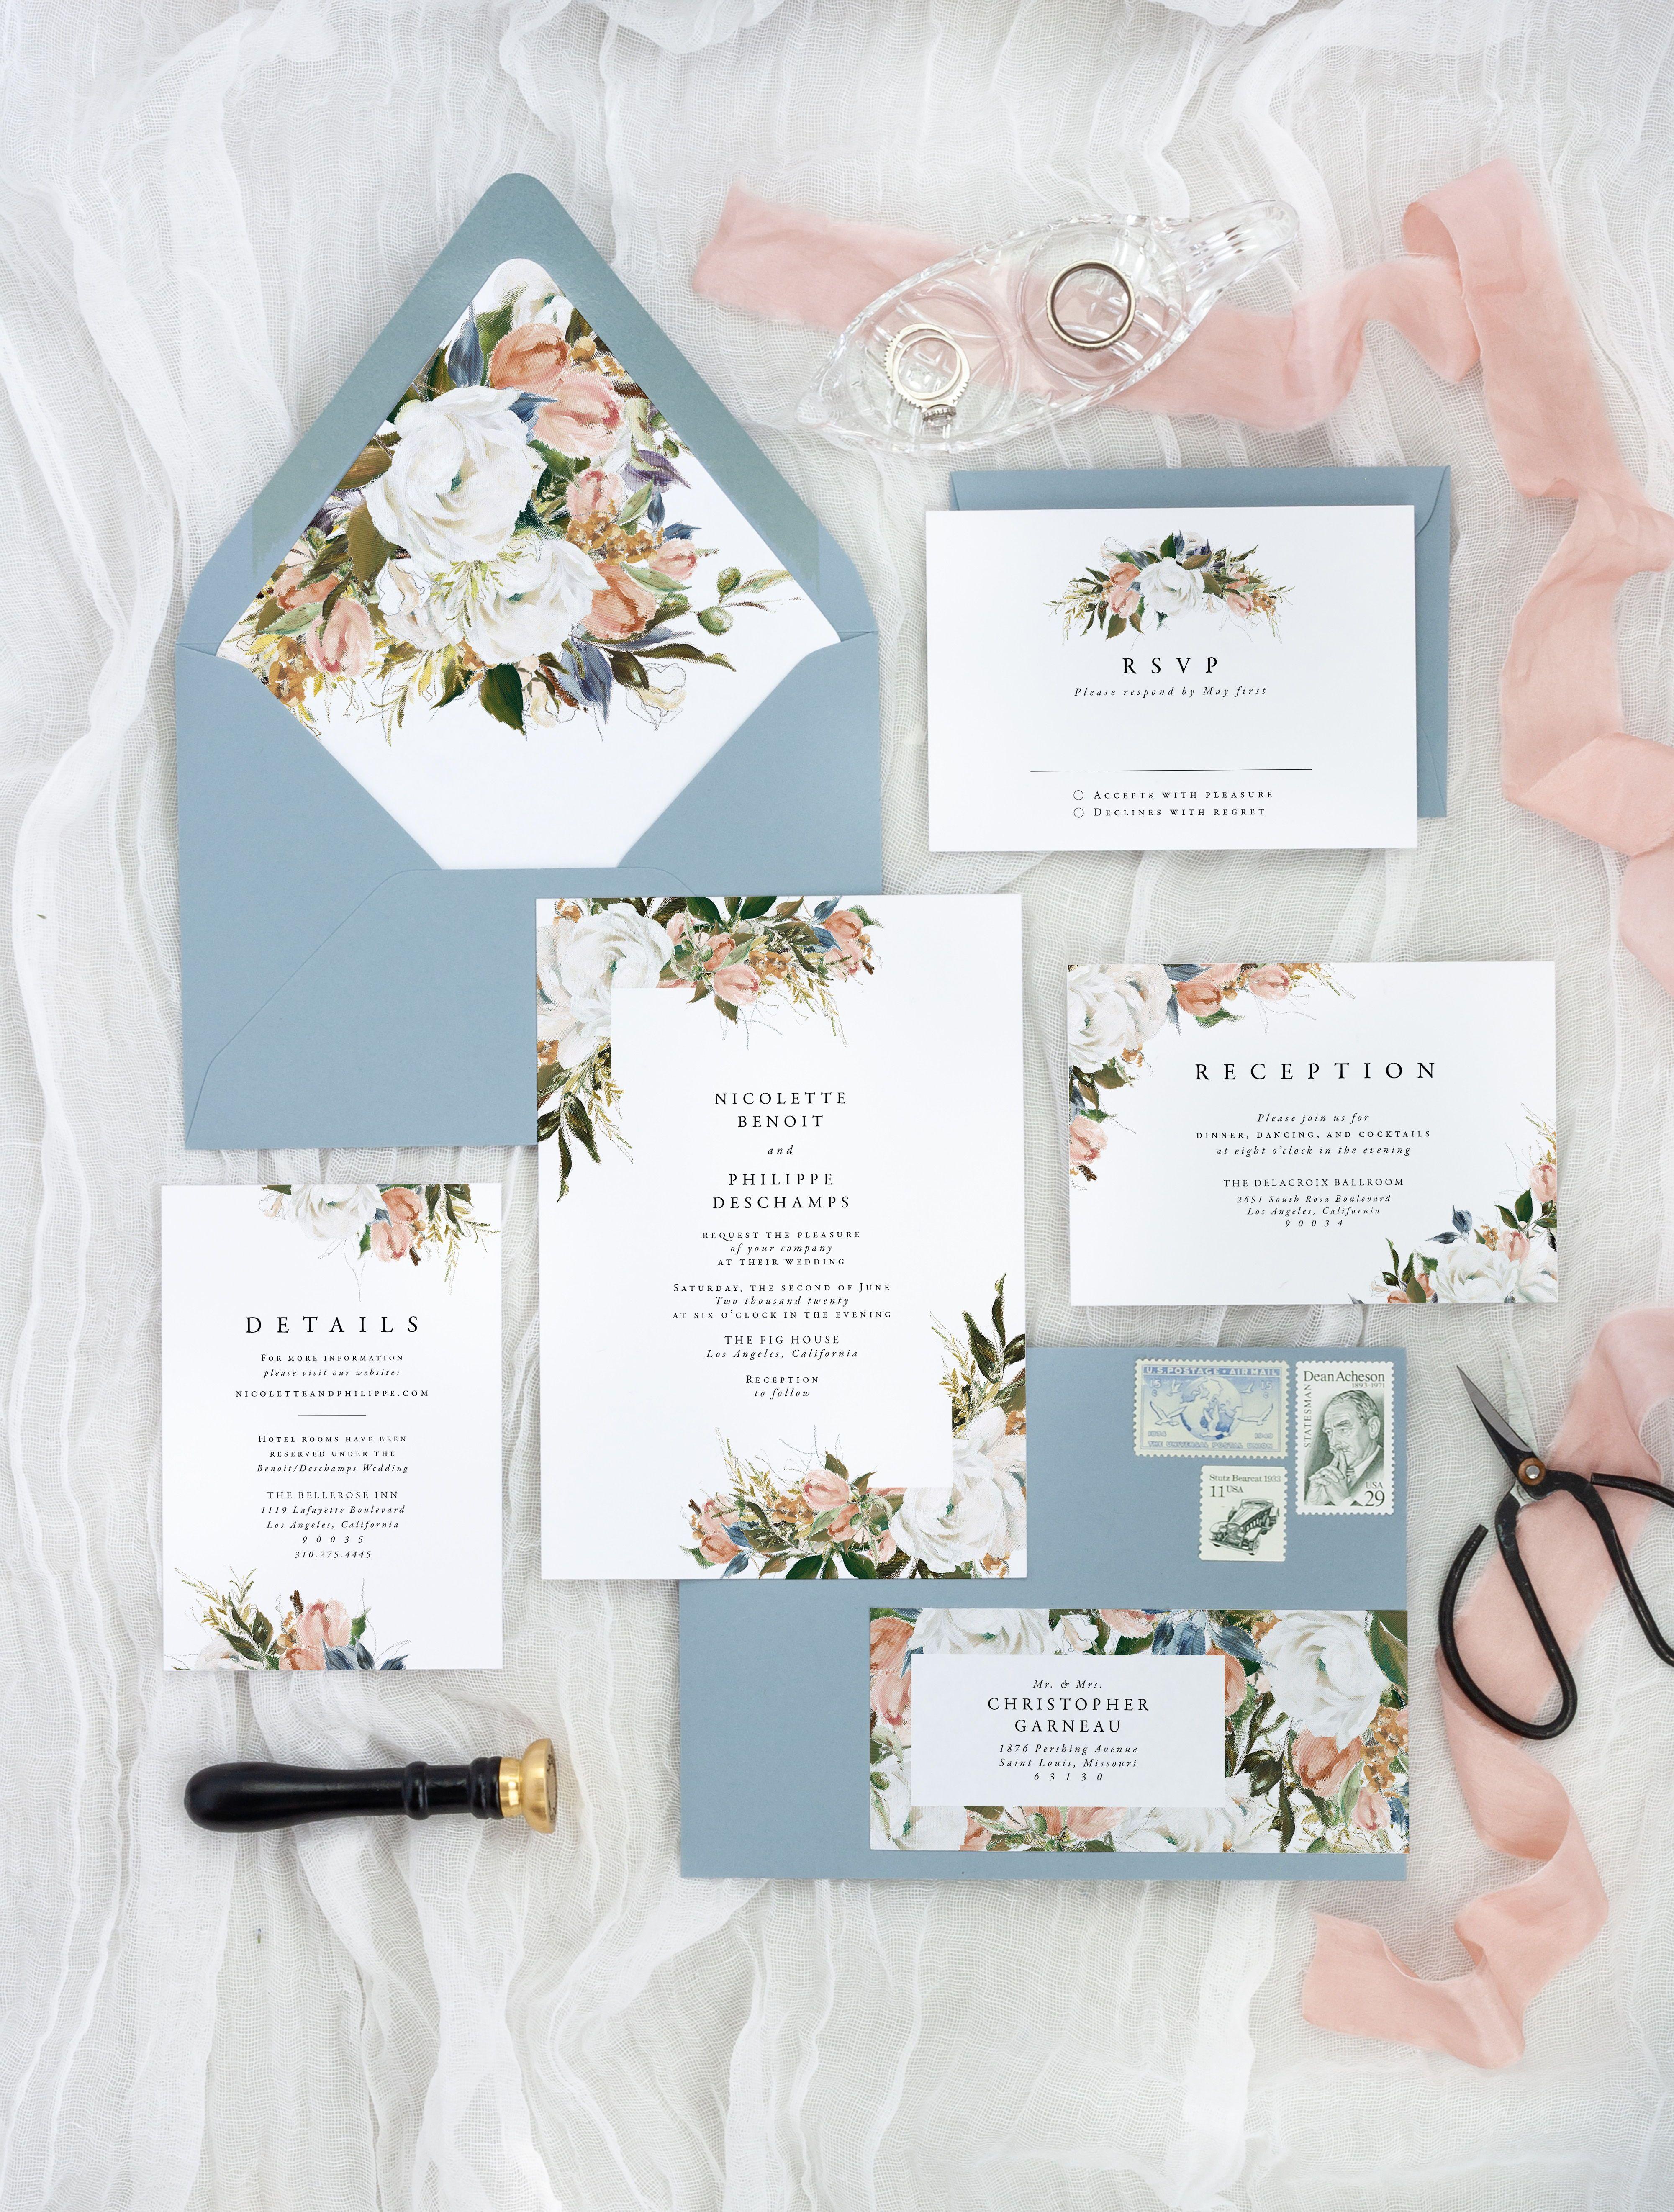 Floral Wedding Invitation Set Rustic Wedding Invites Romantic Wedding Invitat In 2020 Wedding Invitations Romantic Wedding Invitation Sets Floral Wedding Invitations